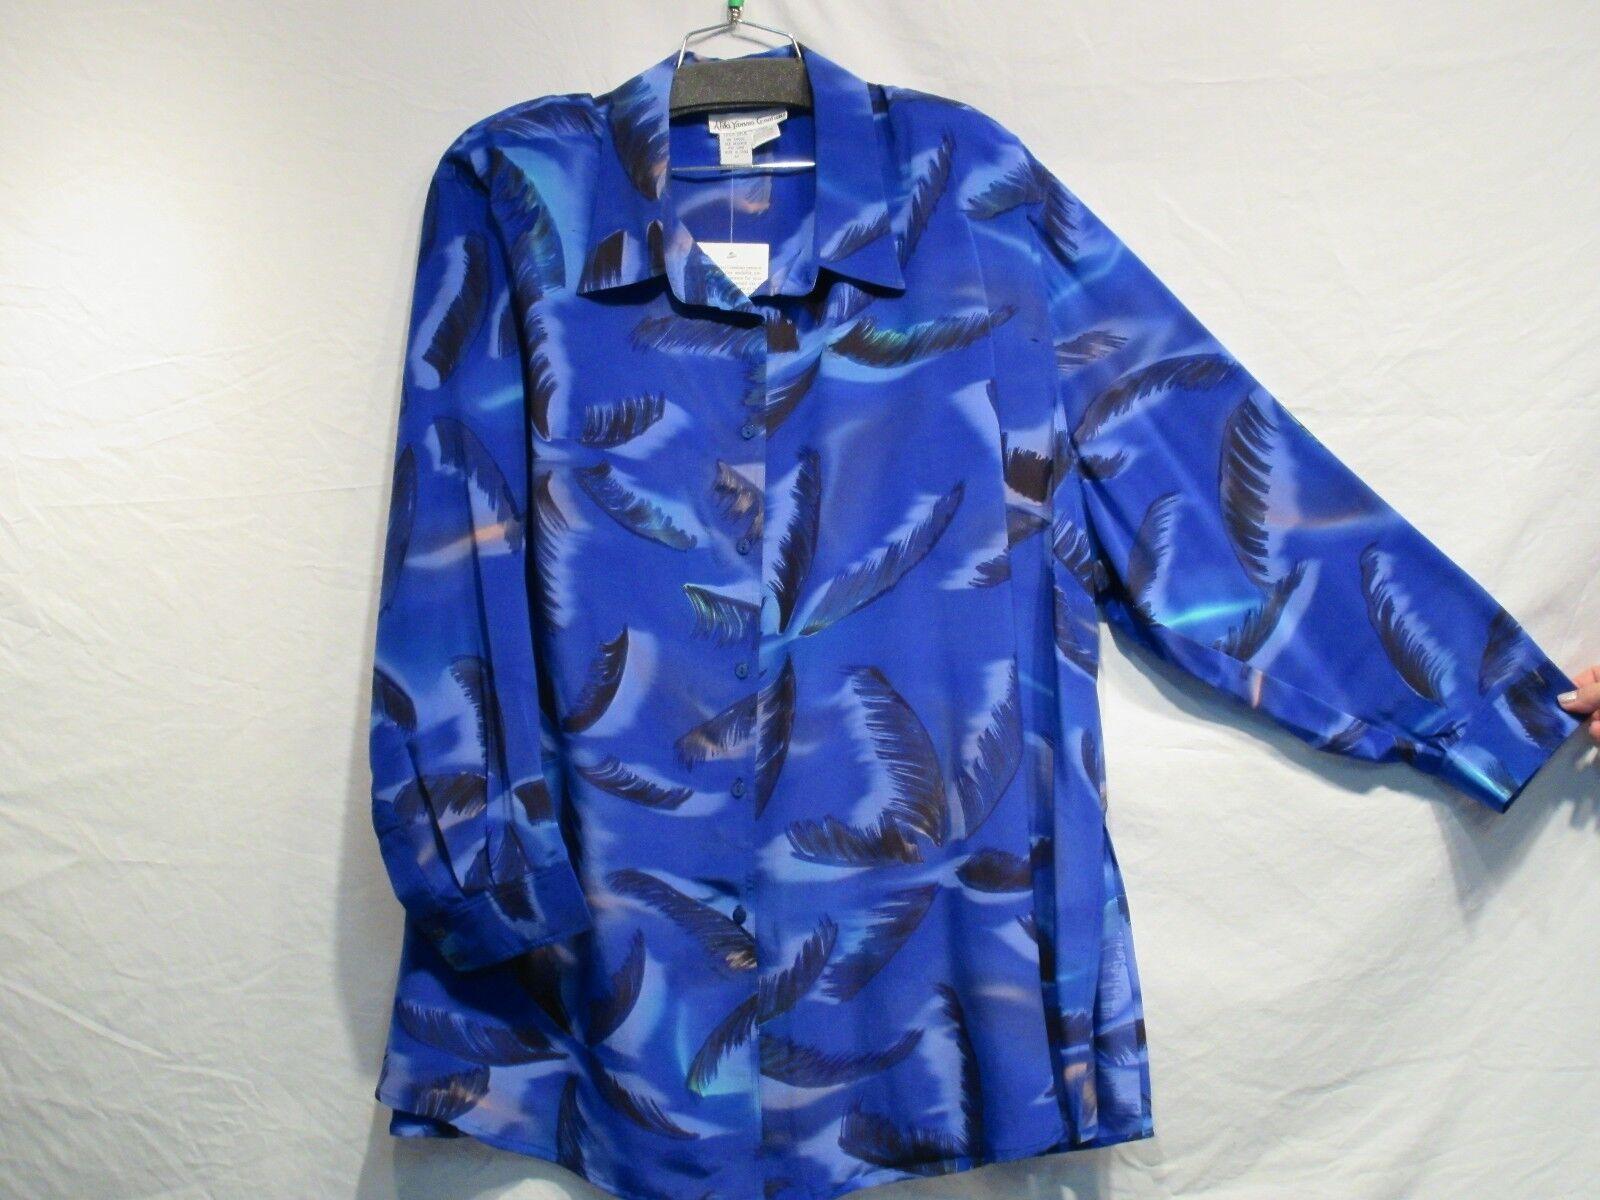 4X Silk Blouse by Aliki Yamani in Royal Palm Print